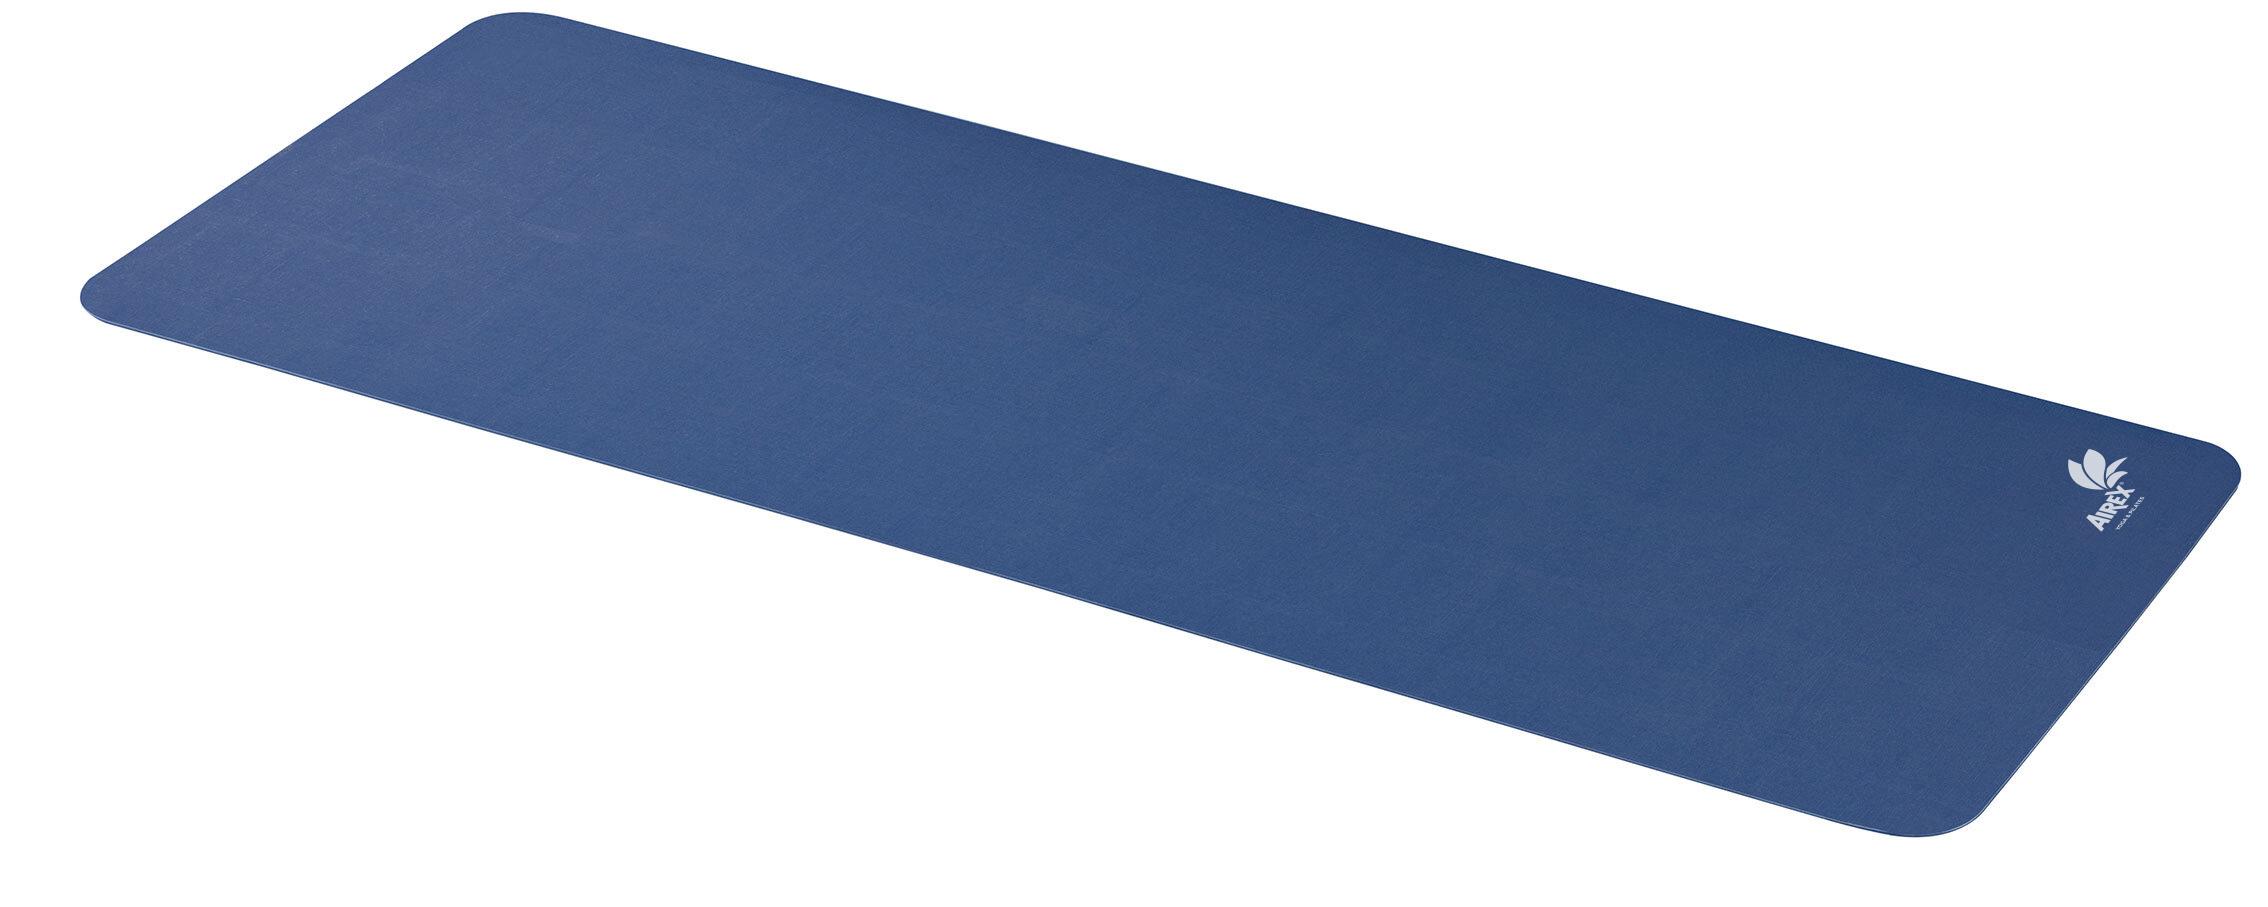 Yoga CALYANA Start mat